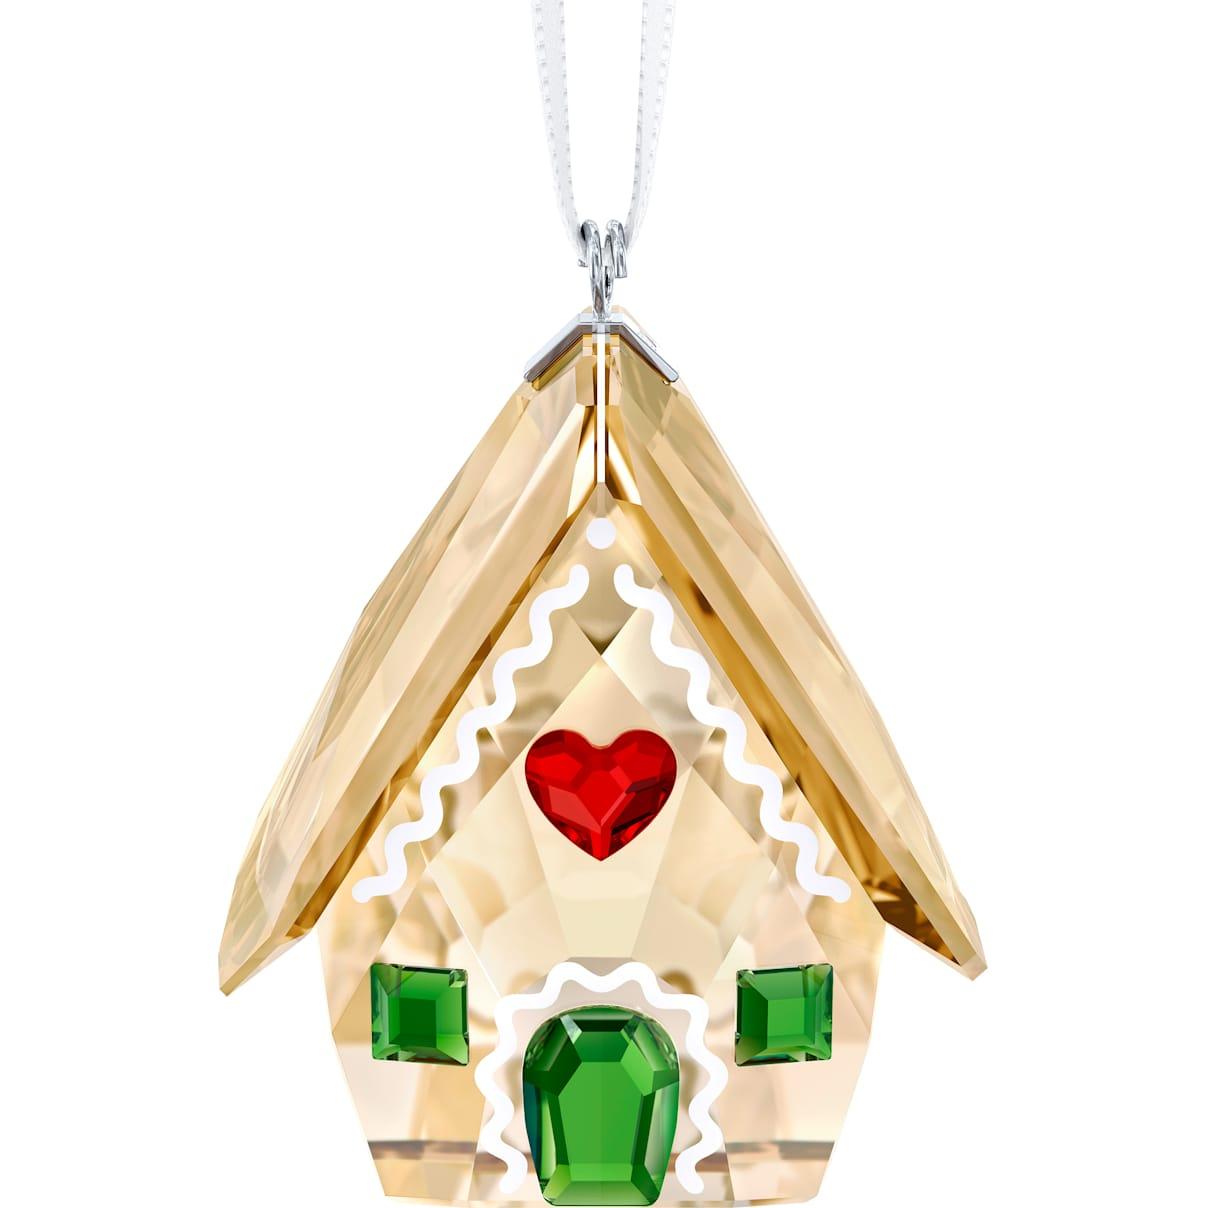 Swarovski Gingerbread House Ornament